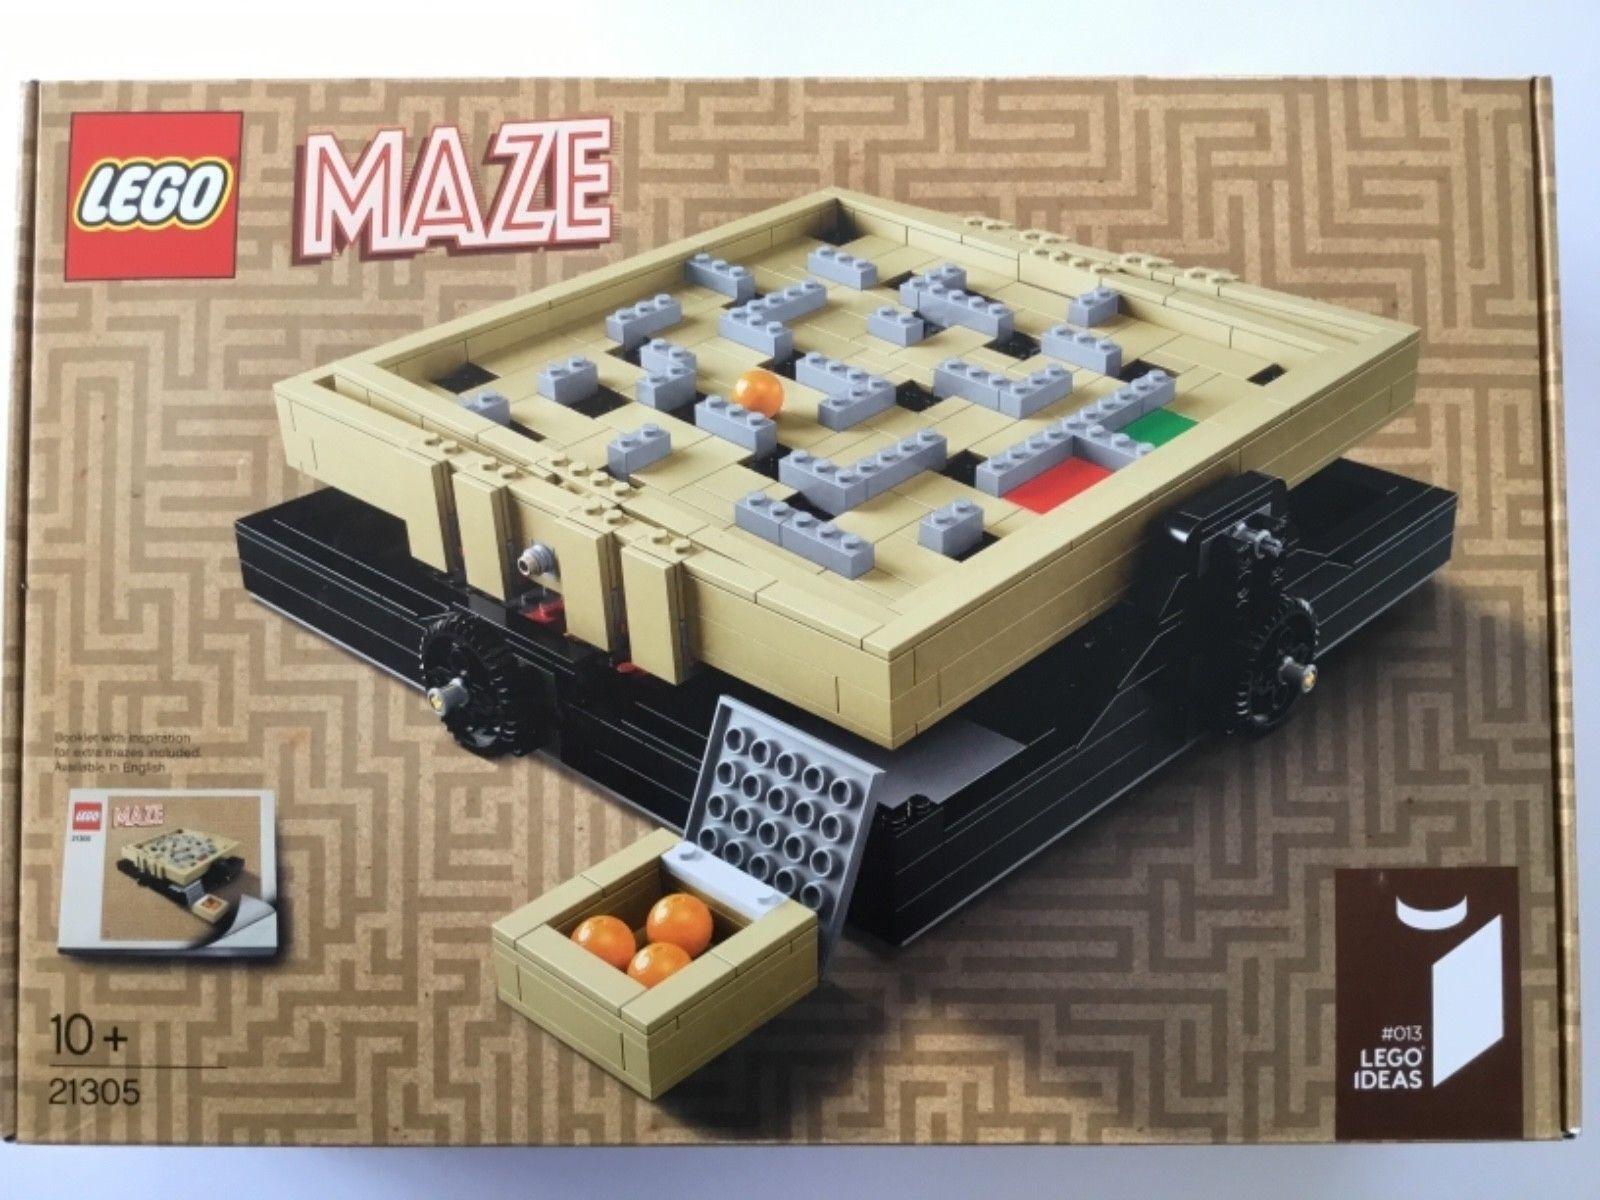 Lego Ideas 21305-Maze Labyrinthe-Nouveau NEUF dans sa boîte